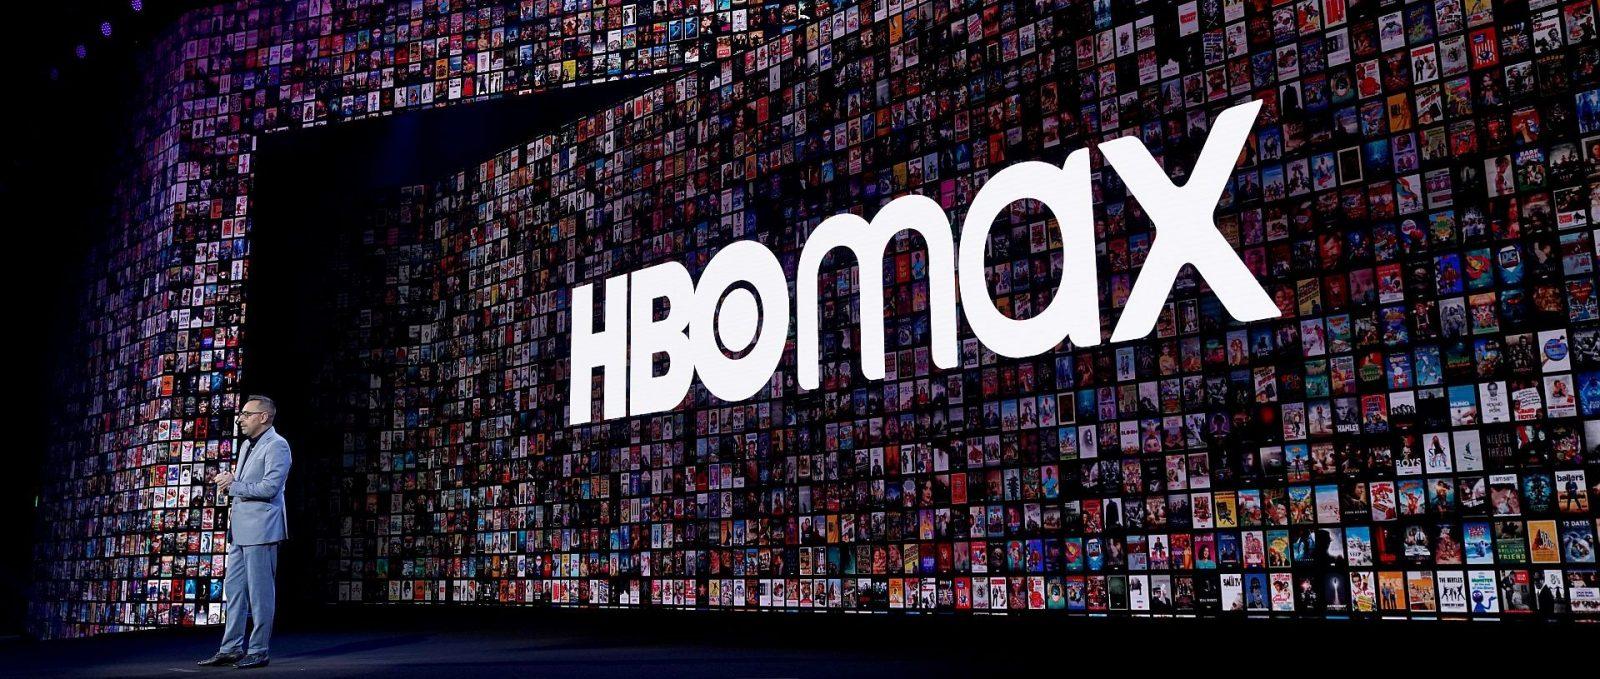 Сервис HBO Max анонсировал три новых сериала